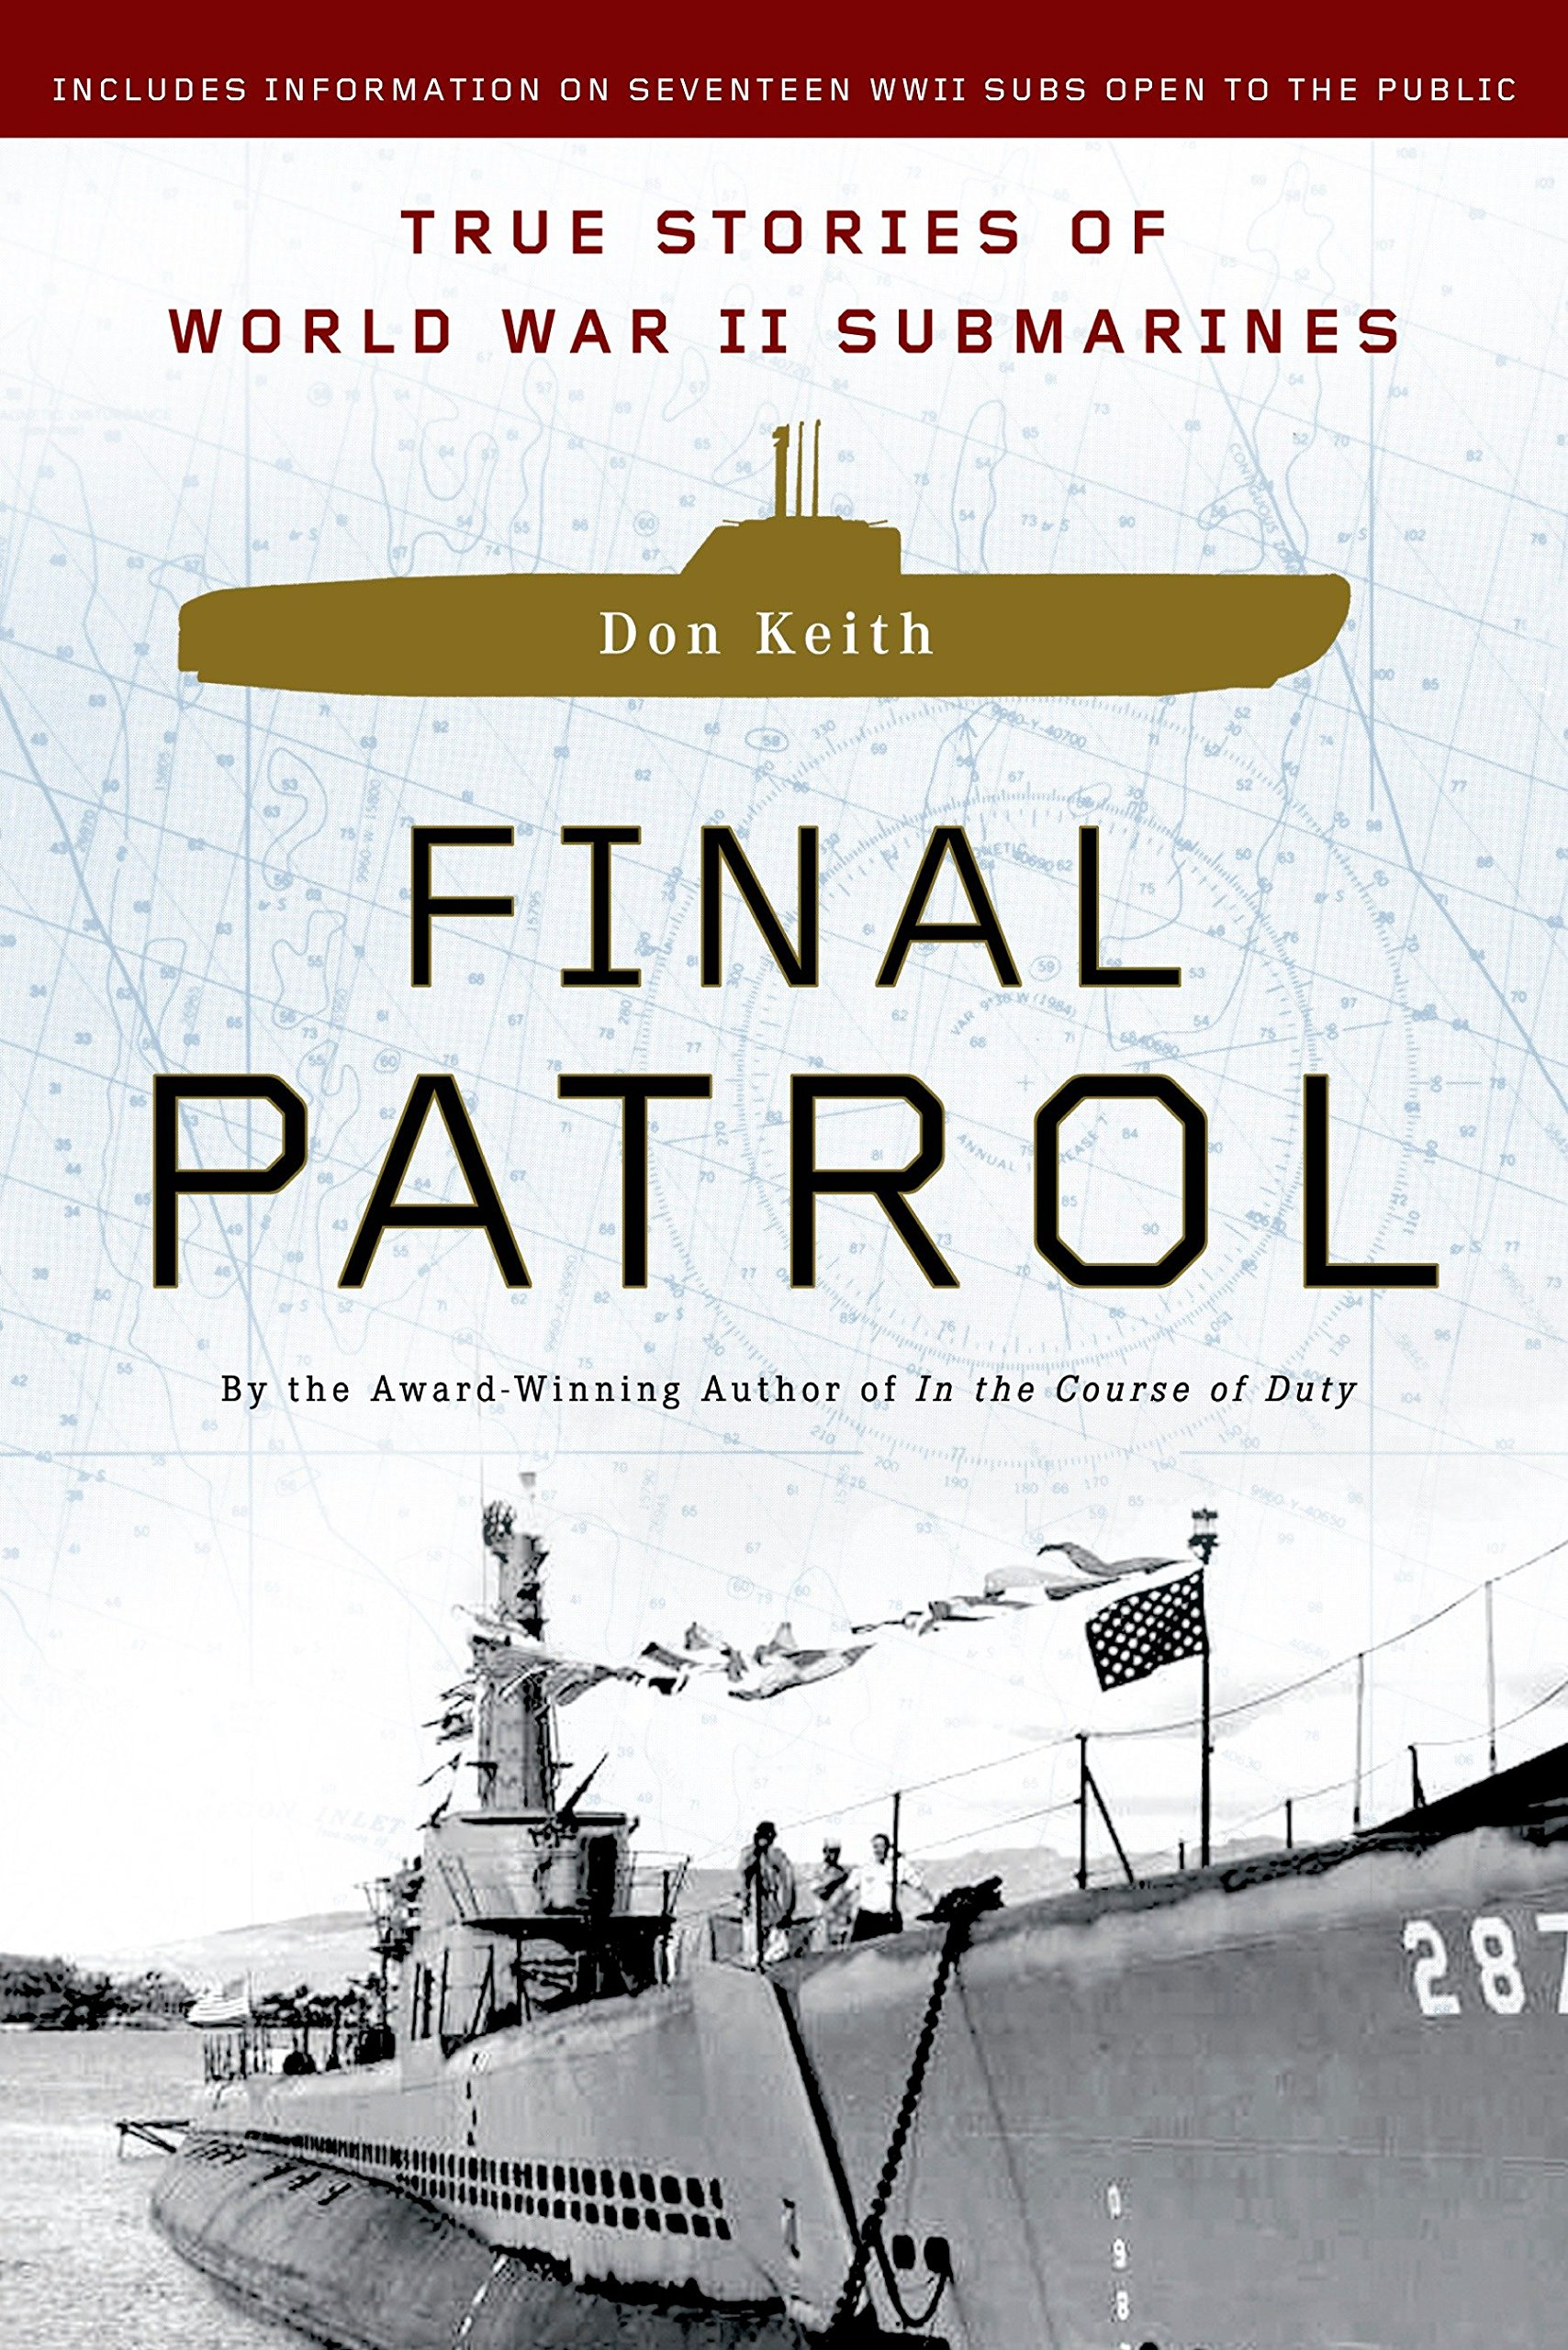 Final Patrol: True Stories of World War II Submarines: Don